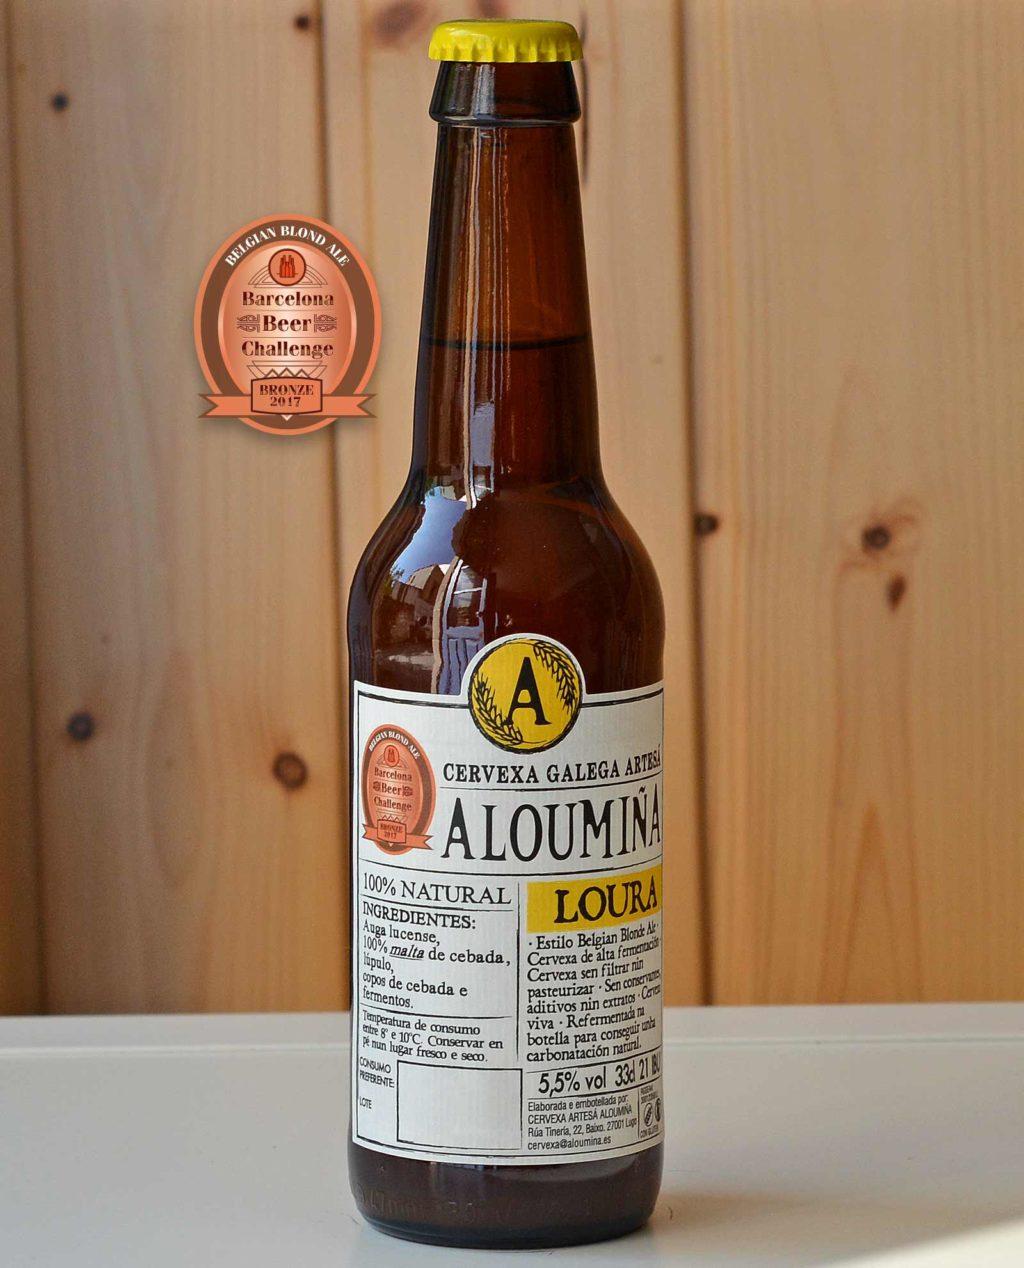 aloumina-cerveza-artesana-craft-beer-lugo-galicia-loura-bbc-barcelonabeerchallenge-belgianblondeale-a